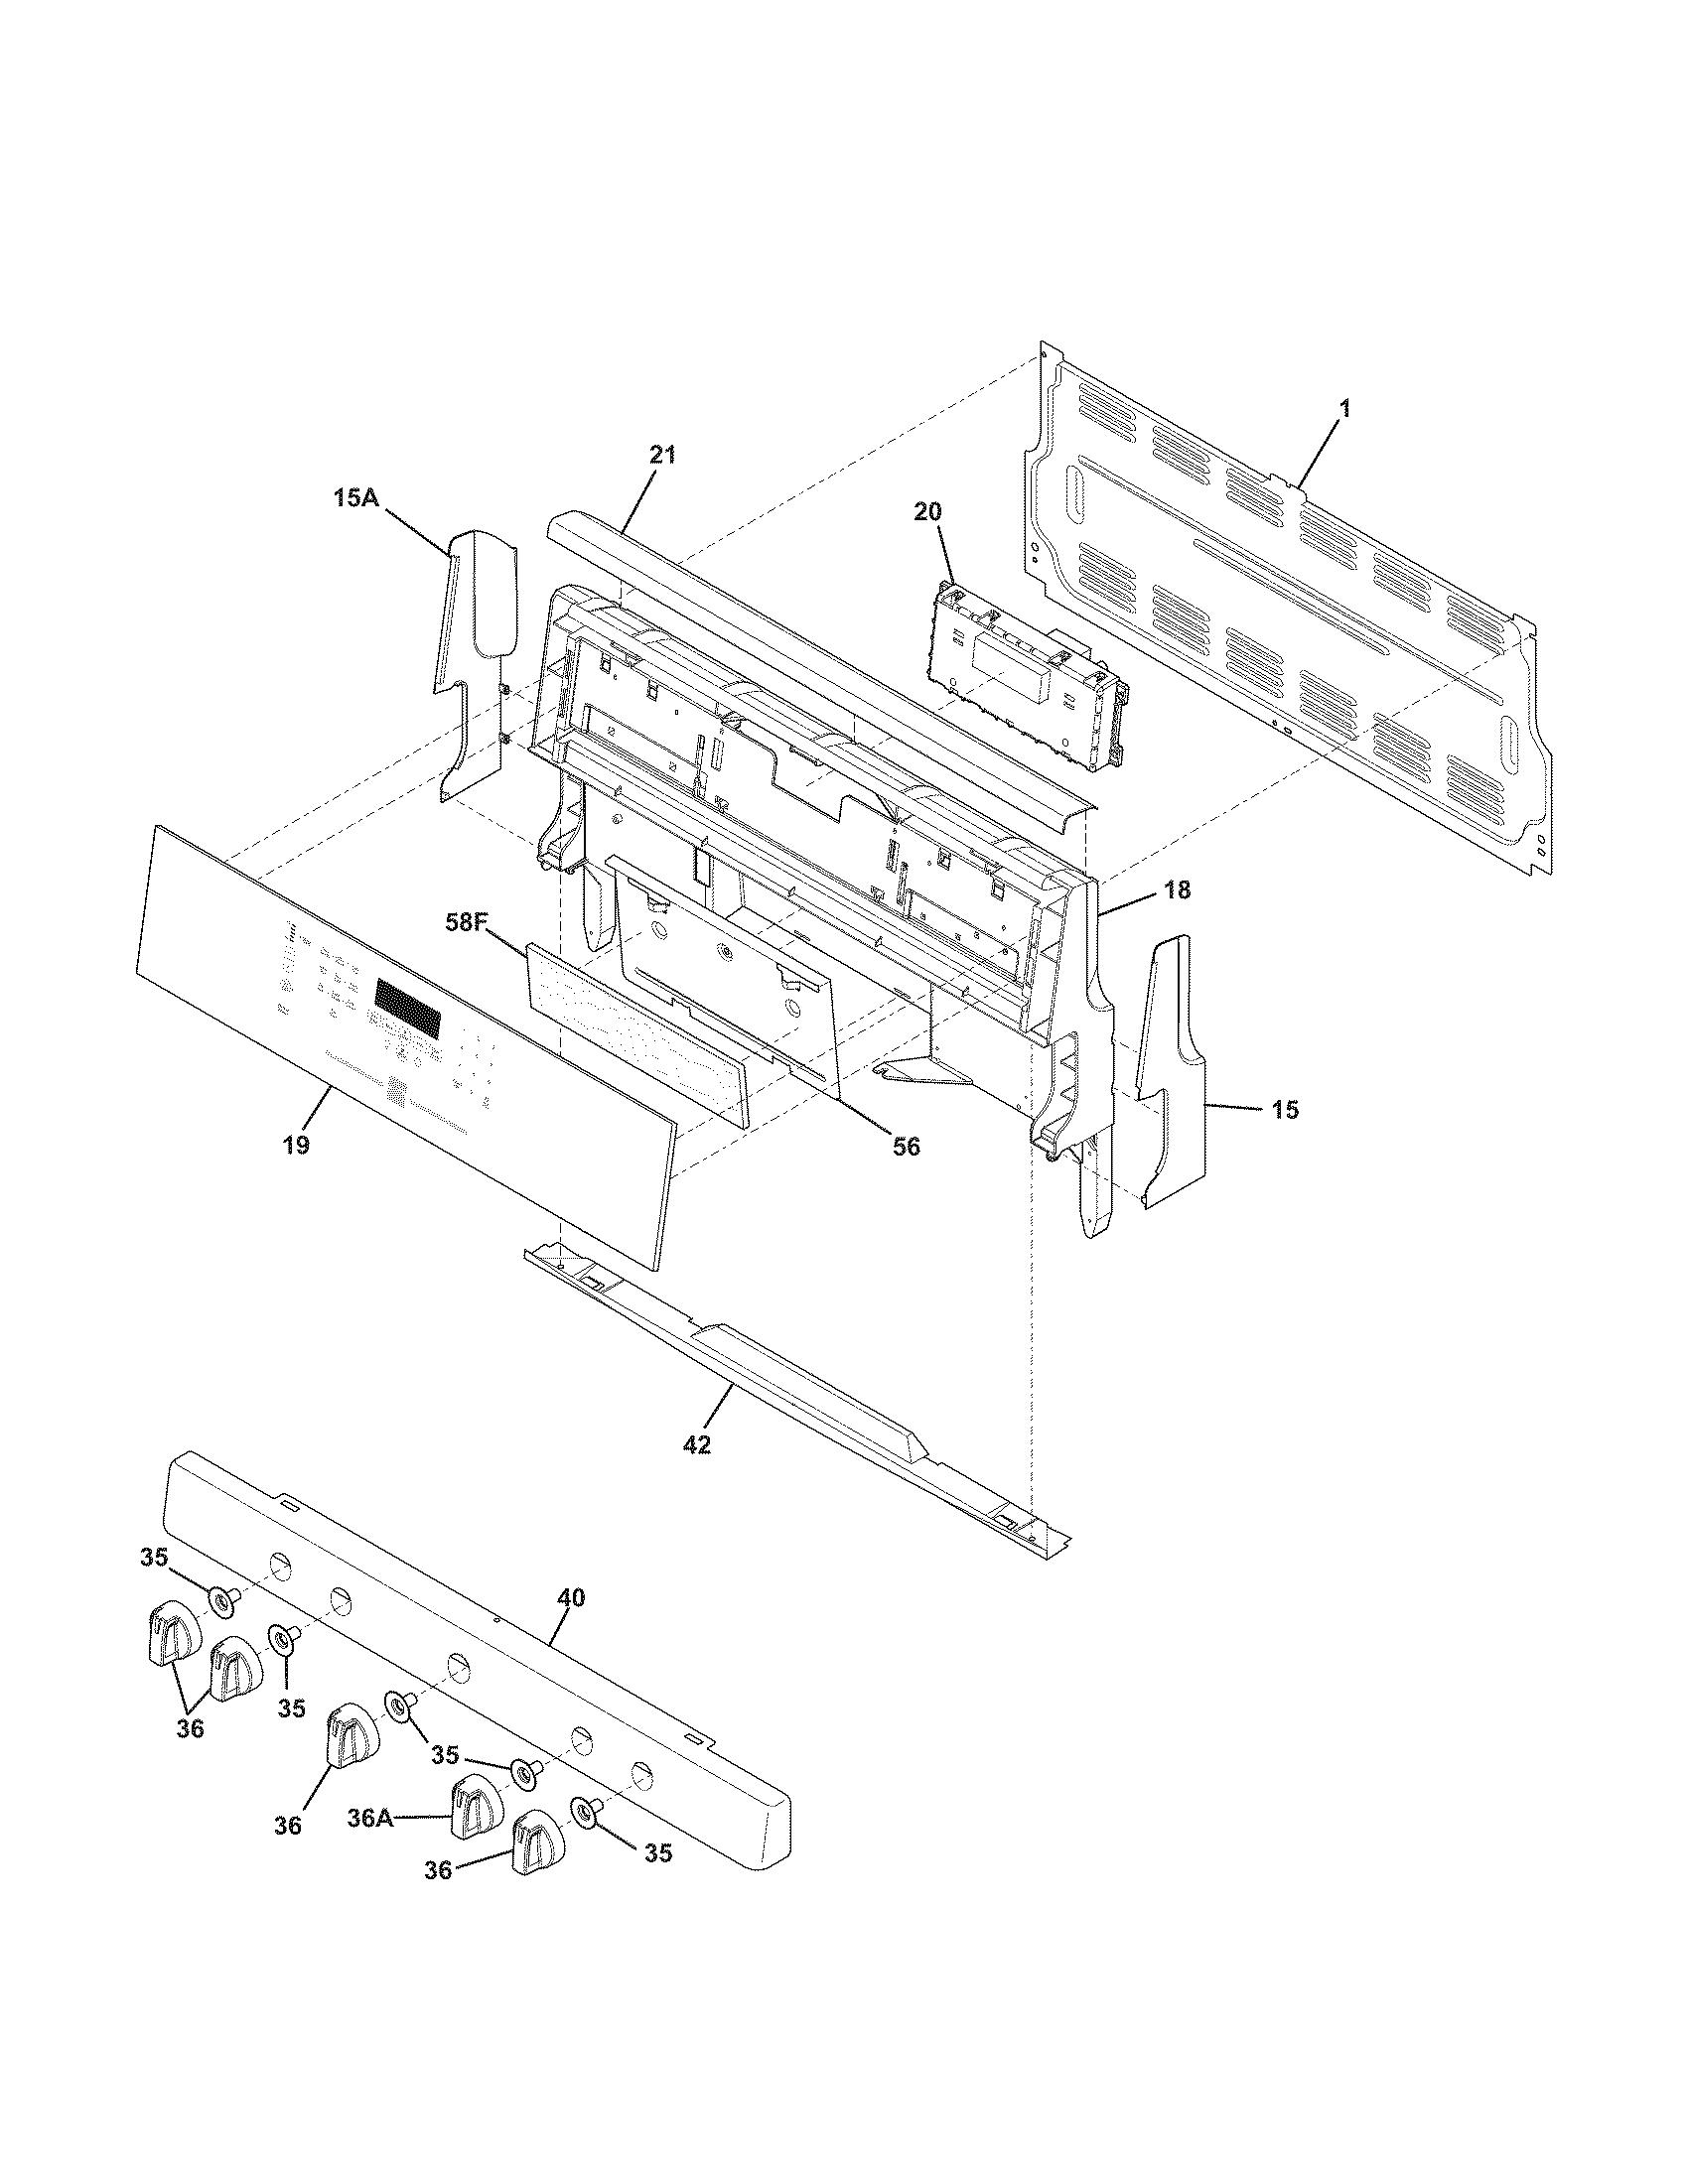 Kenmore Oven Manual 790